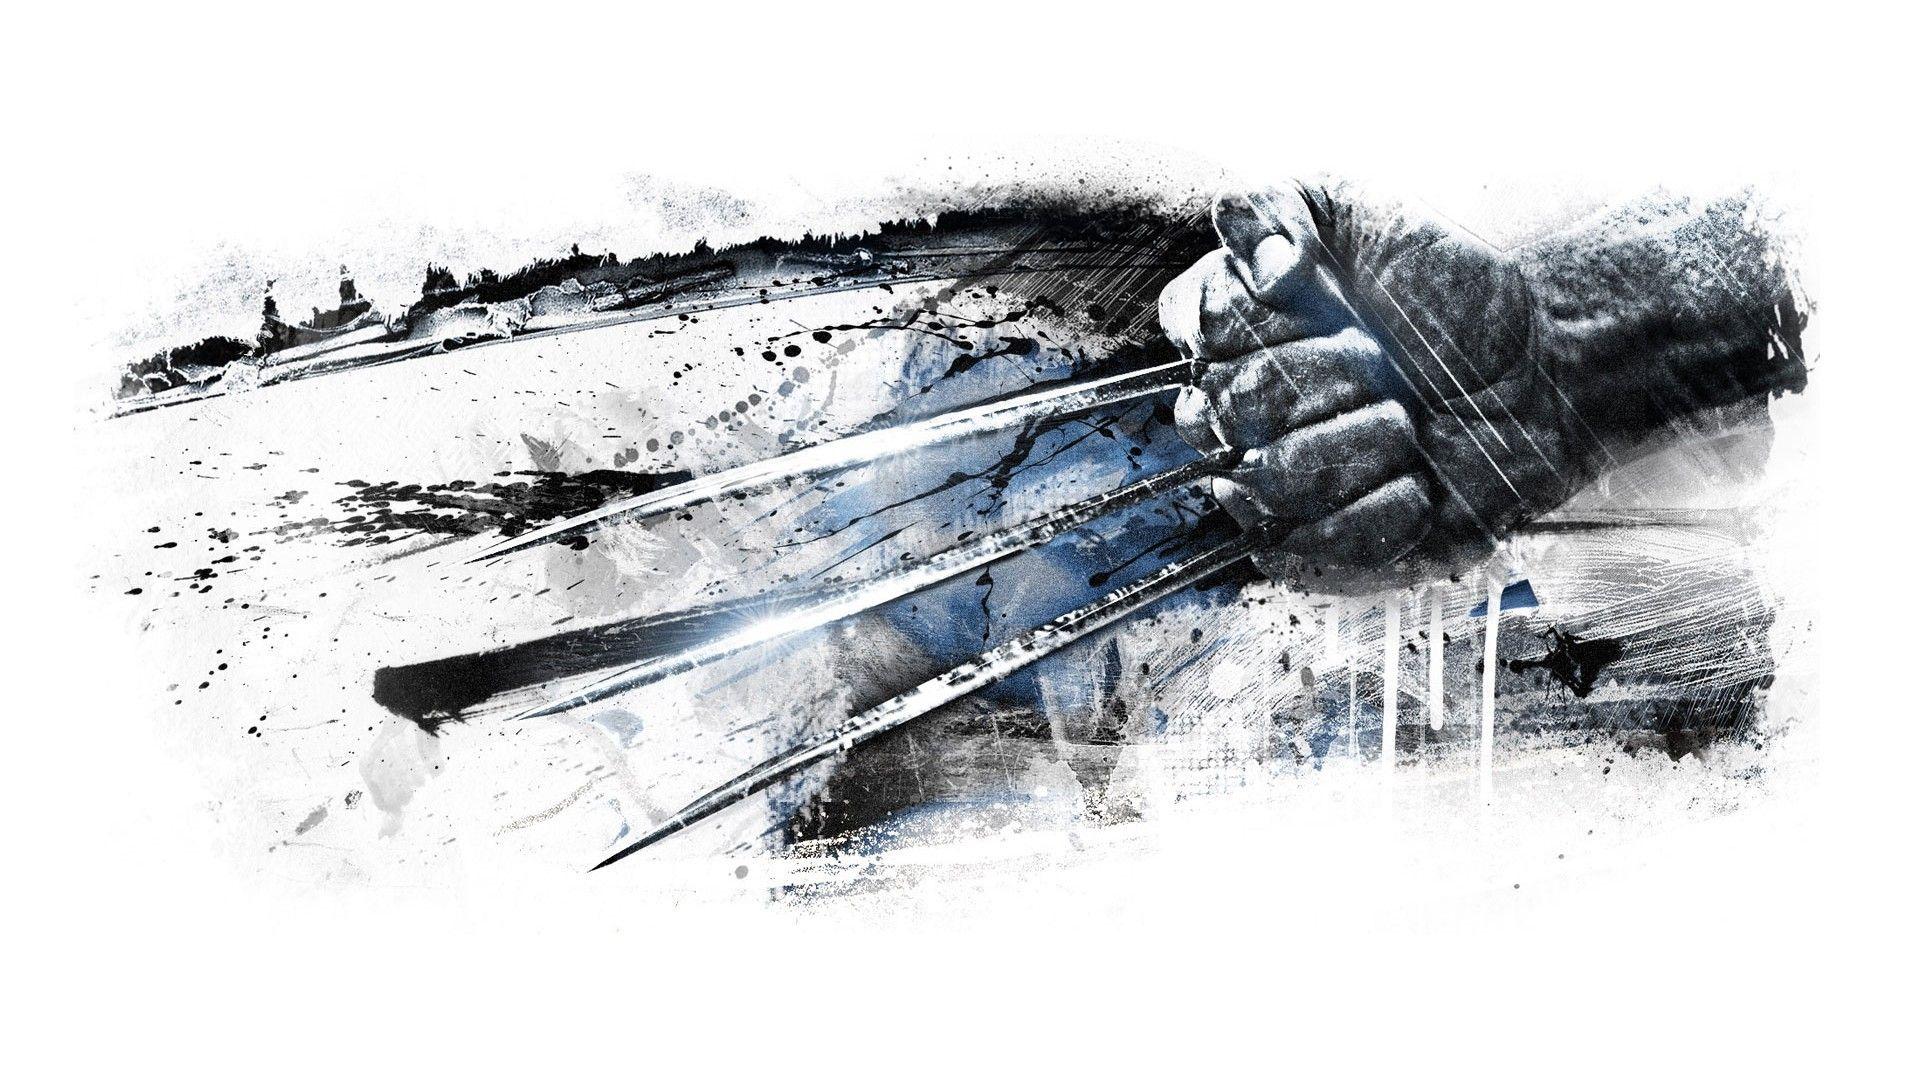 21 X Men Origins Wolverine Hd Wallpapers Backgrounds Wallpaper Abyss The Wolverine Arte Gloton Wallpapers En Hd